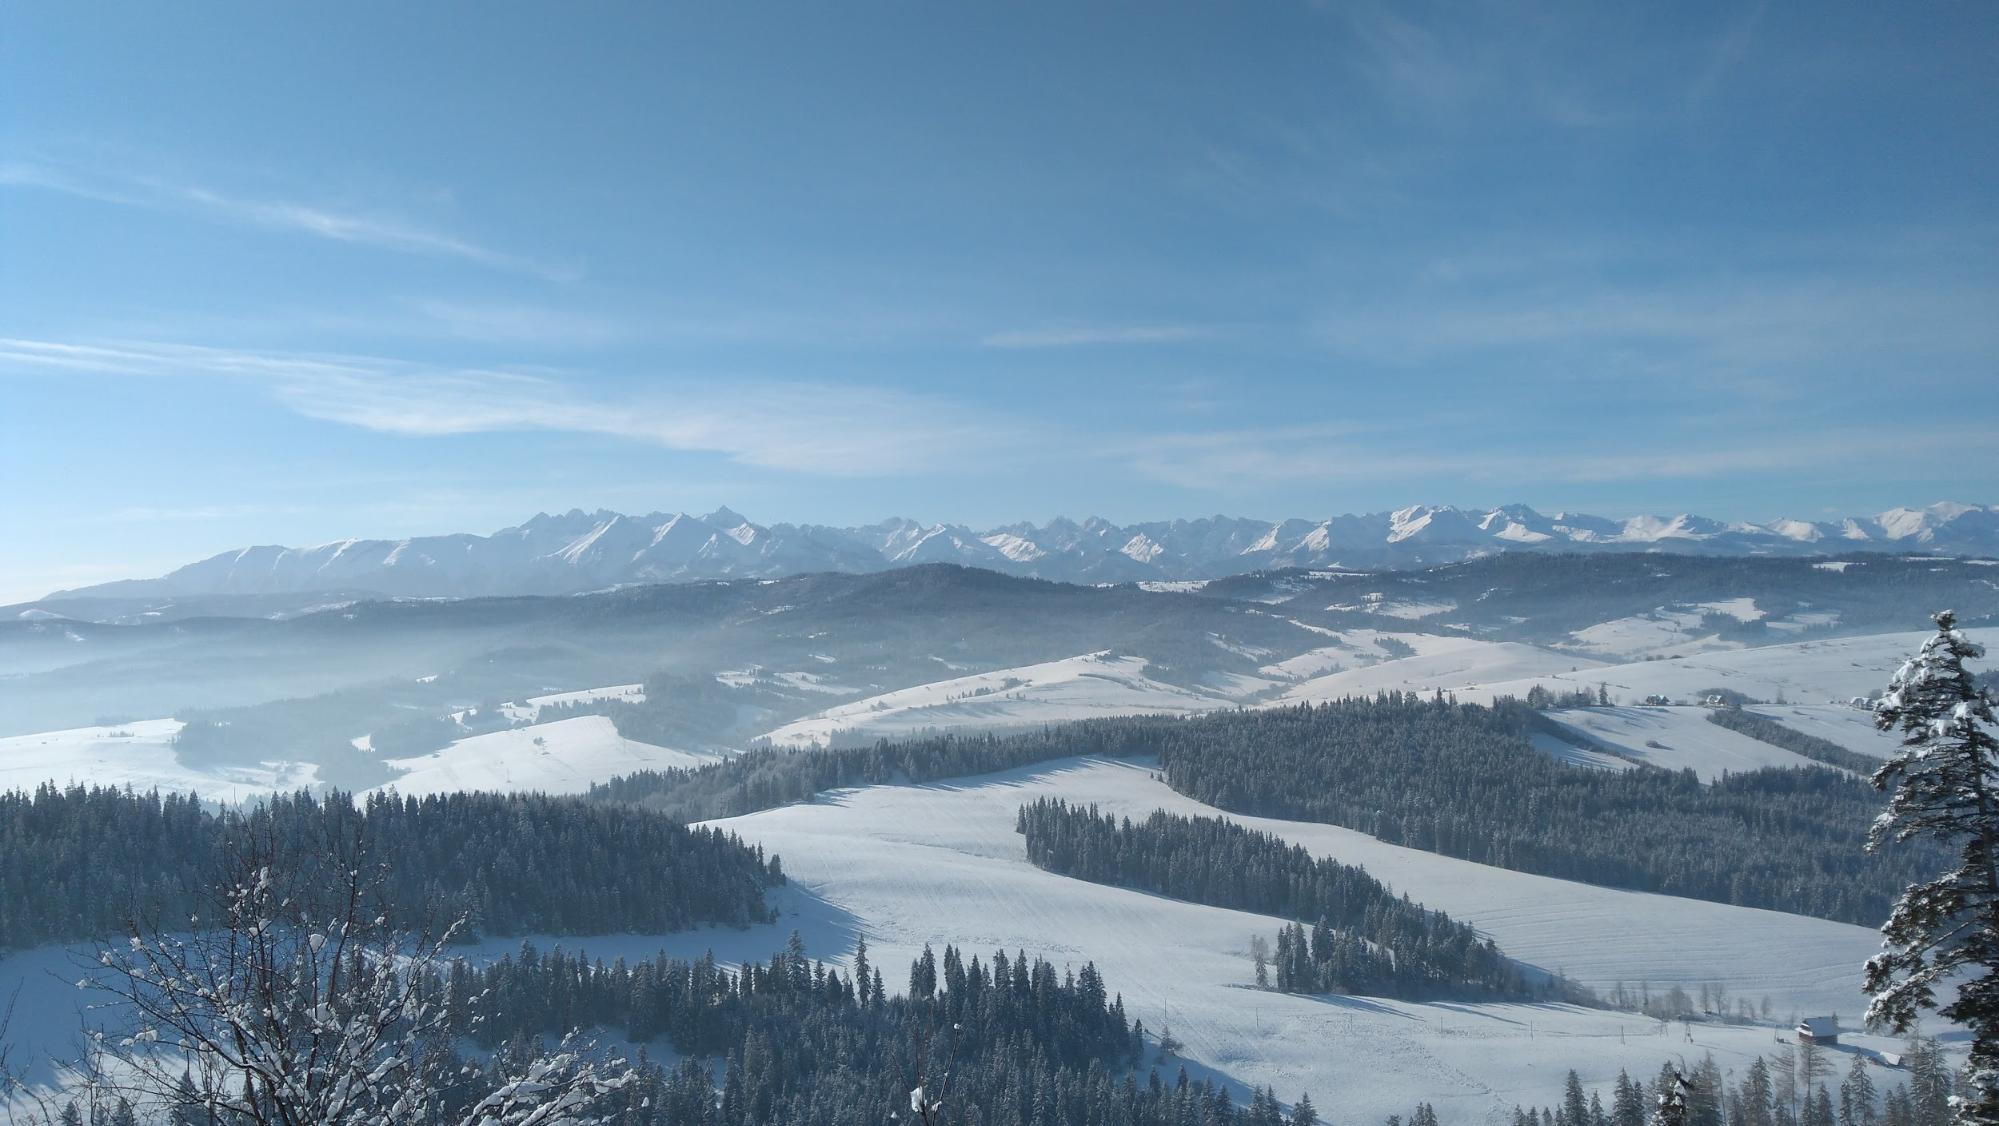 Zimowy Ultra Janosik. Żor - panorama Tatr